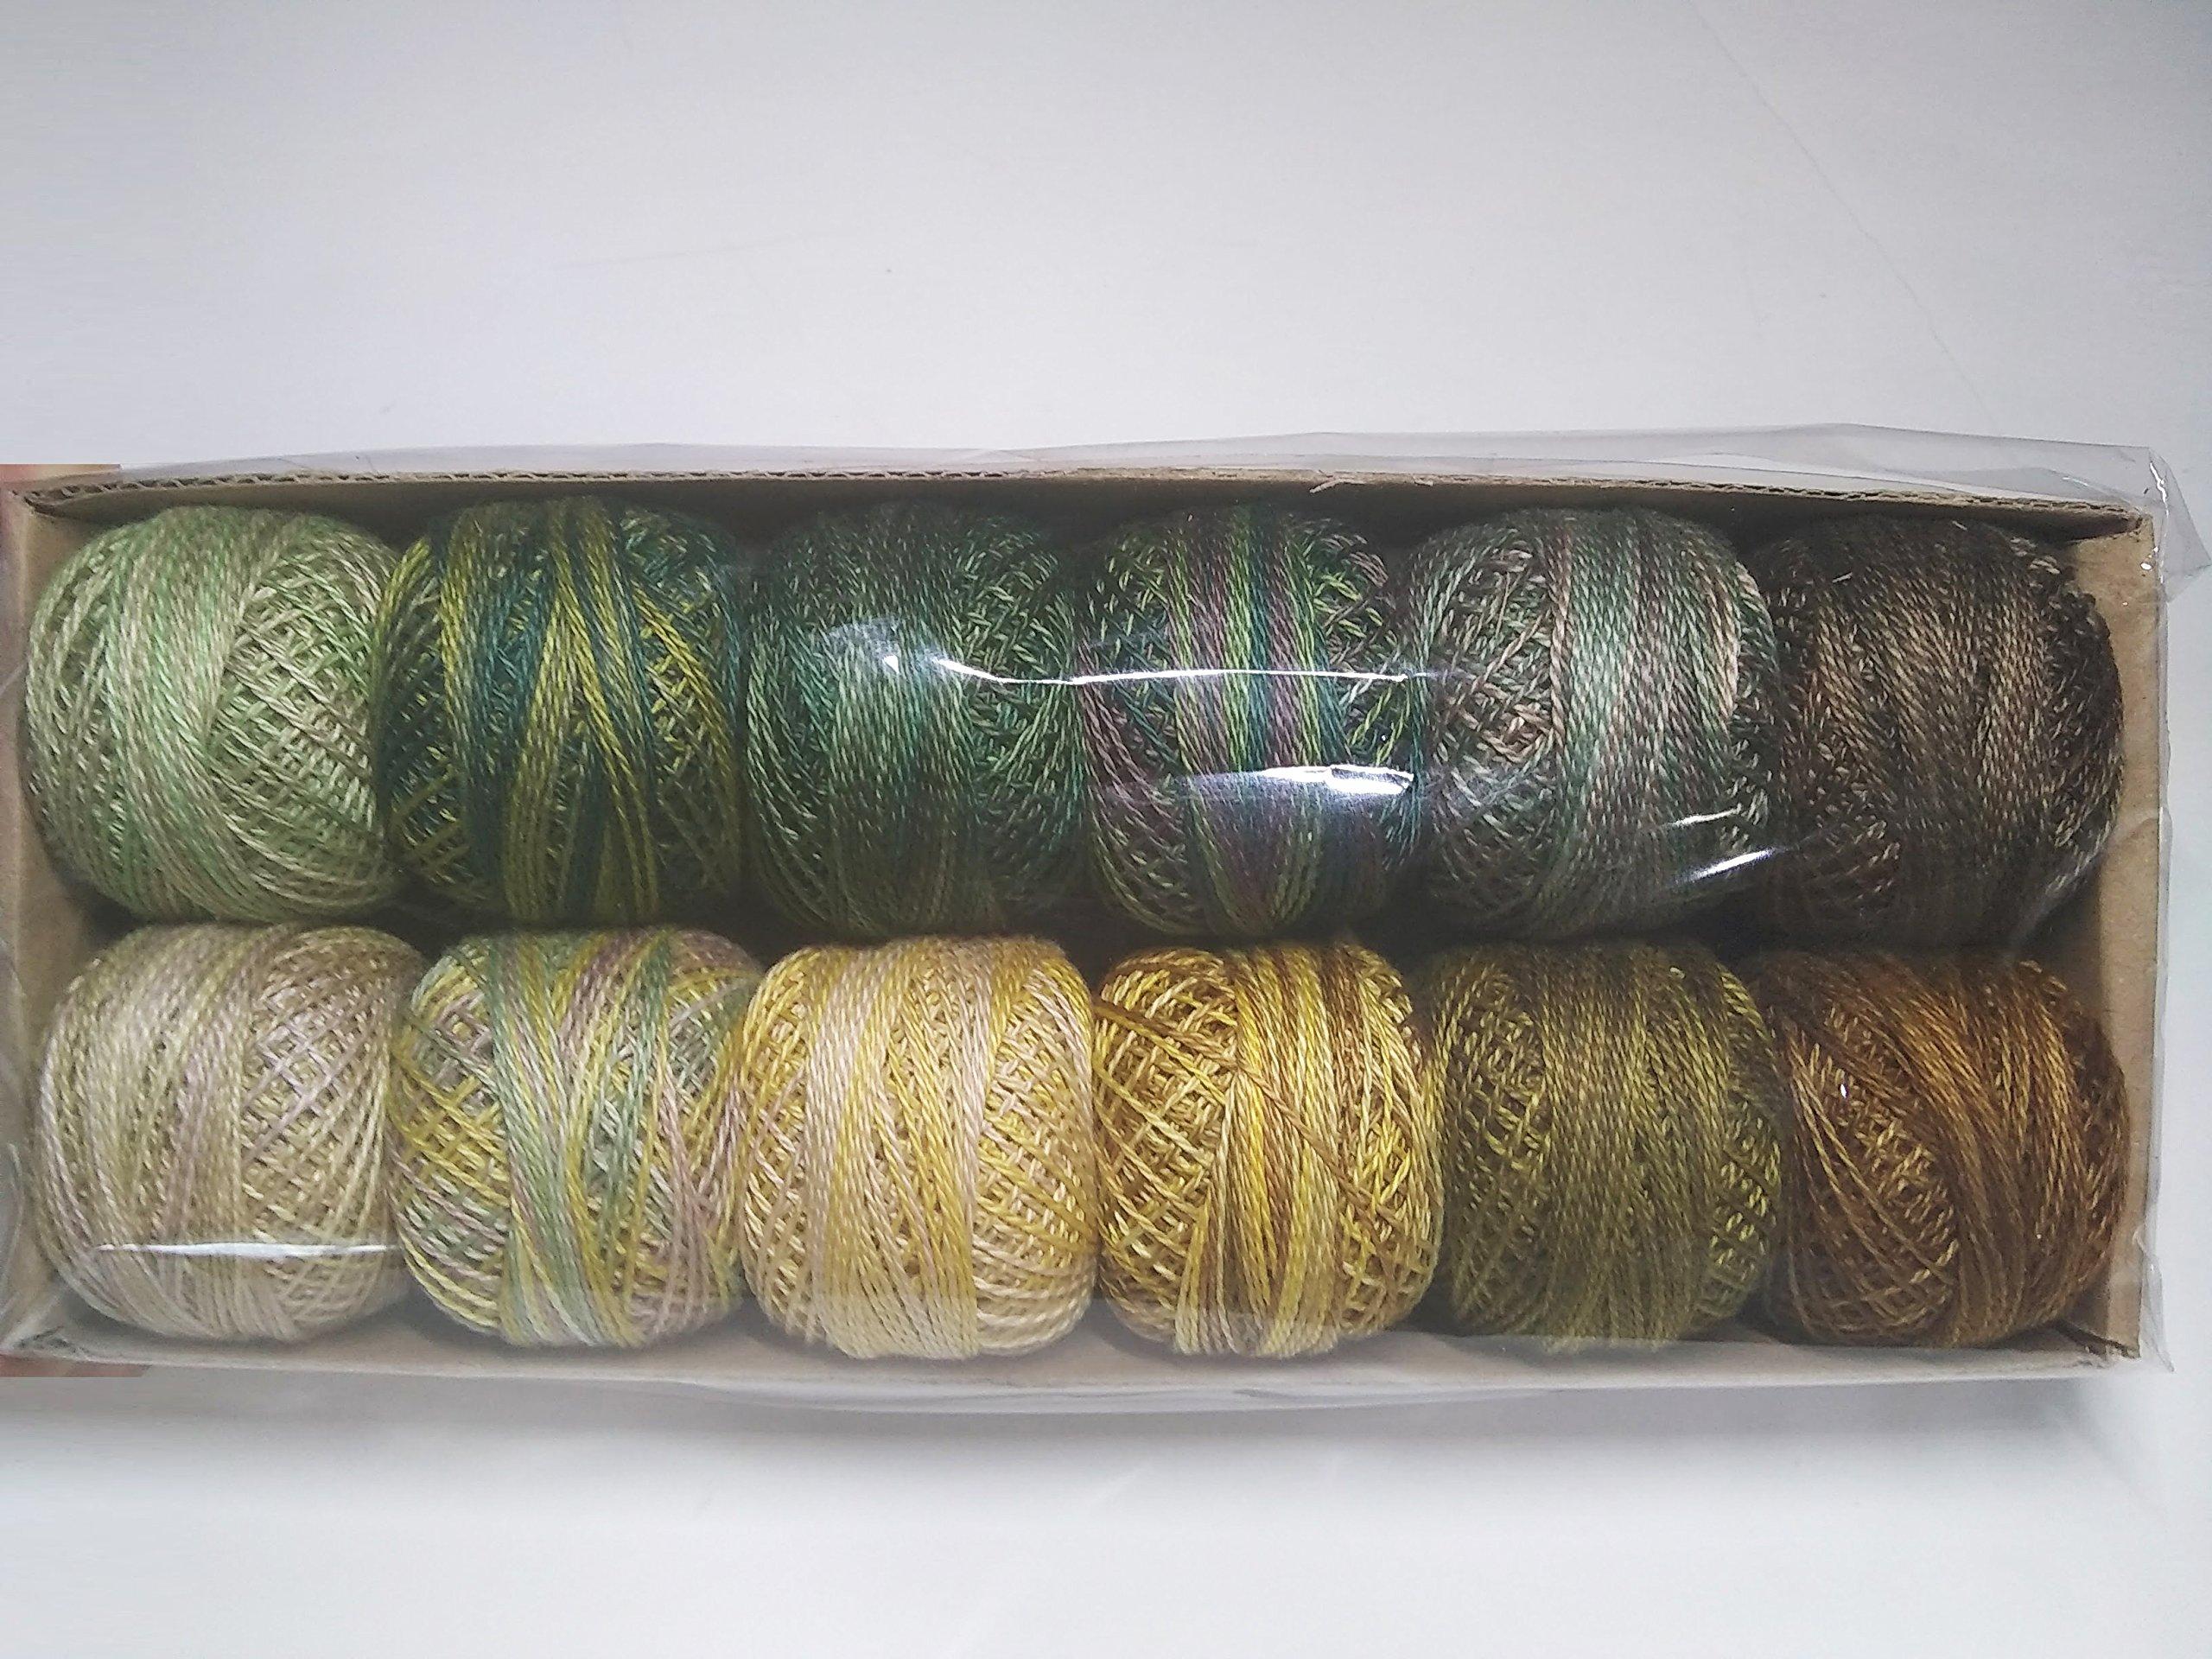 Valdani Perle Cotton Size 8 Embroidery Thread - ''Delicious Pistachios'' Sampler Set ... by Valdani